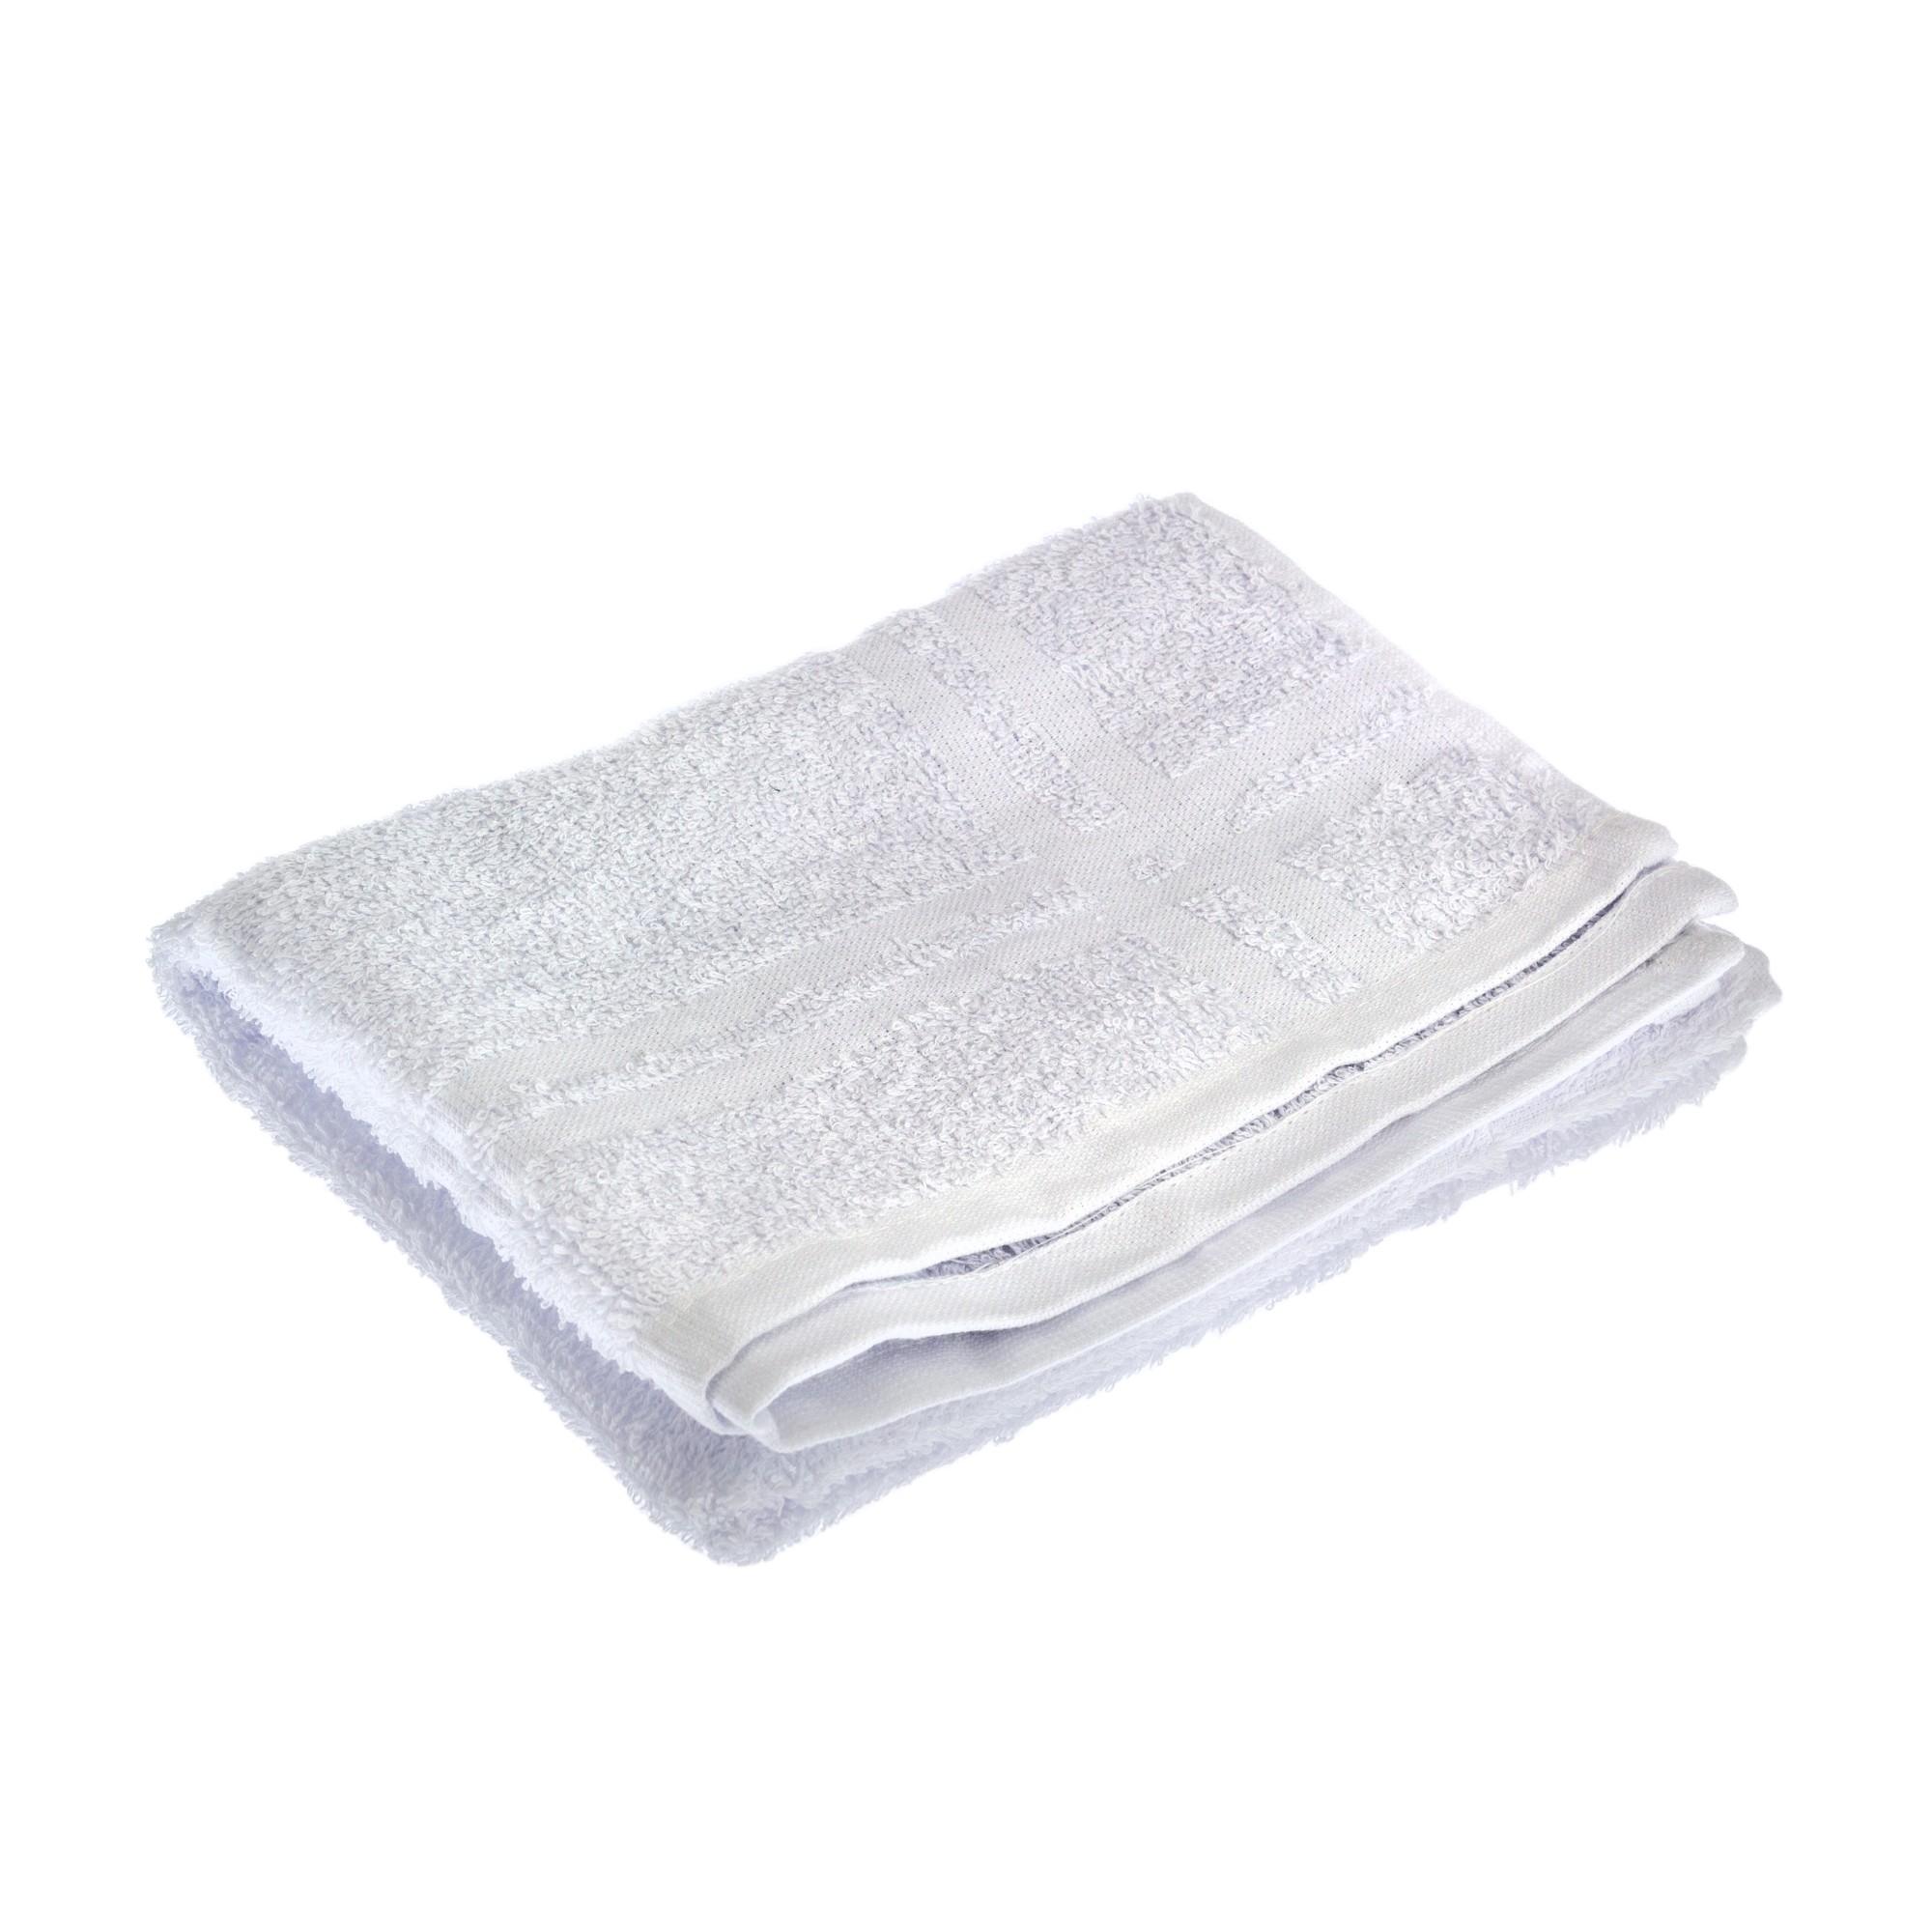 Toalha de Piso Branca Felpuda 42x68 cm 100 Algodao - Marcotex